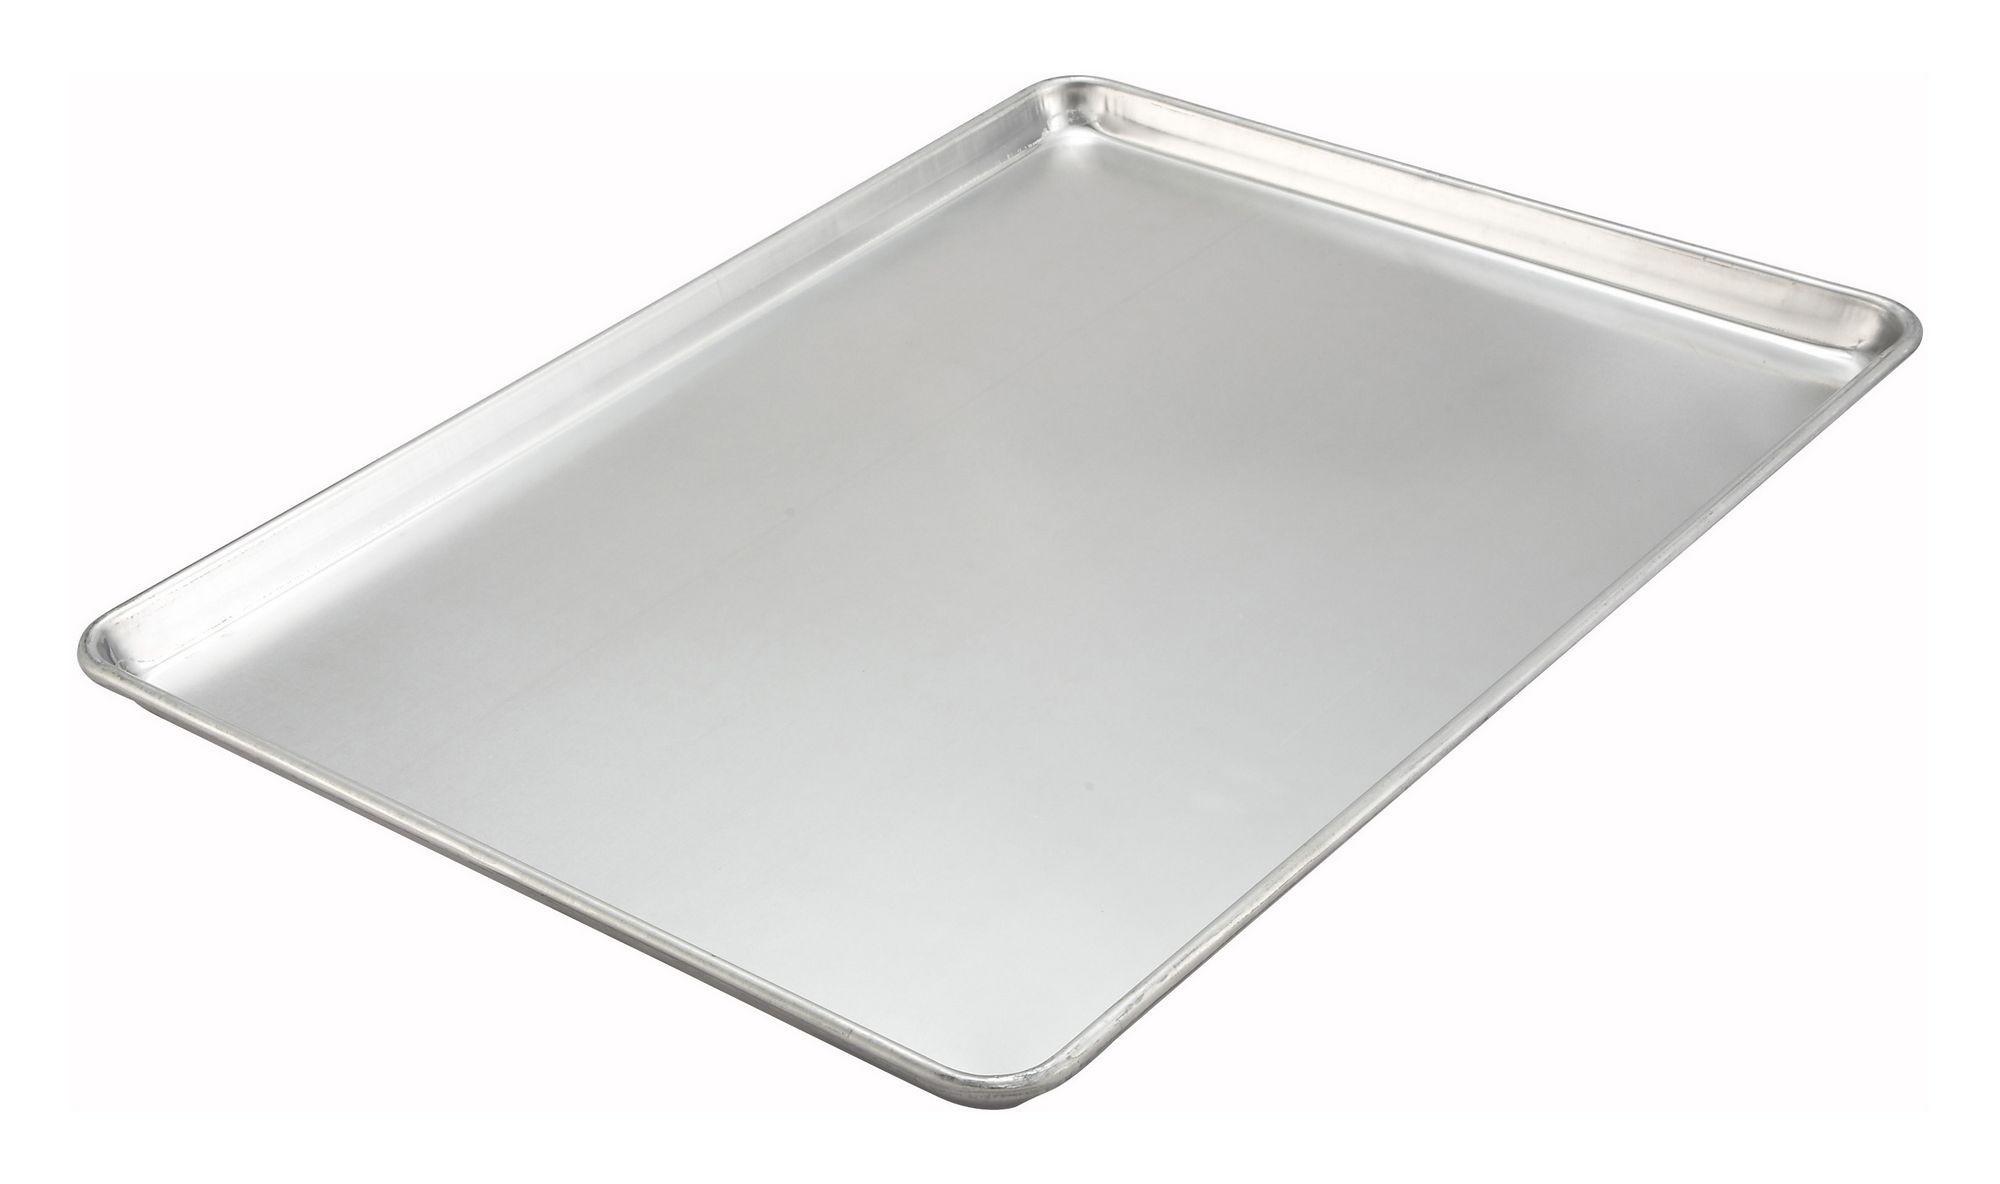 Thunder Group ALSP1013 Quarter Size Aluminum Sheet Pan 9-1/2